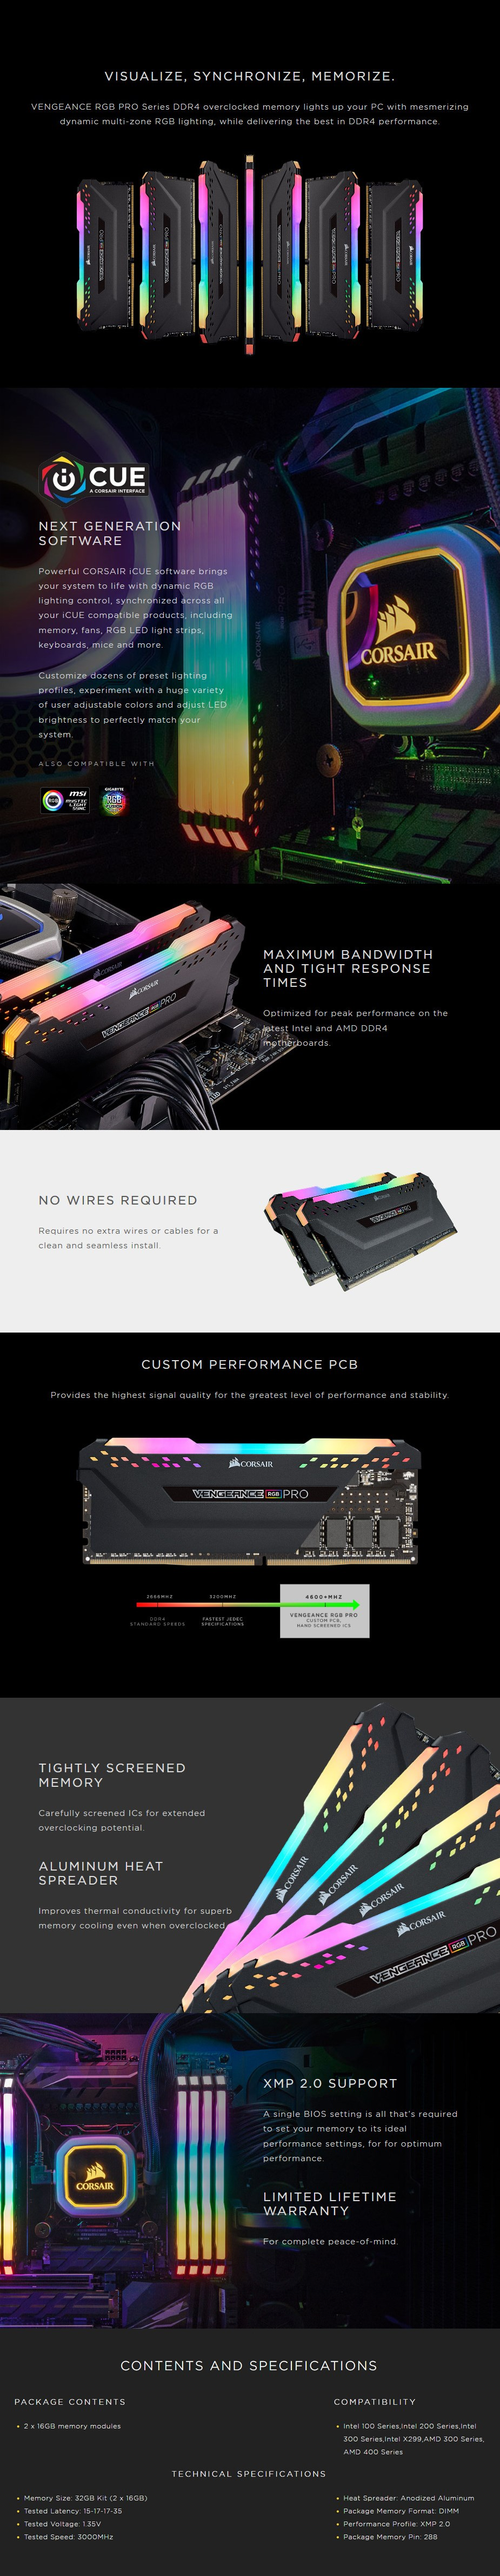 Corsair Vengeance RGB PRO 32GB (2x 16GB) DDR4 3000MHz Memory - Black - Desktop Overview 1